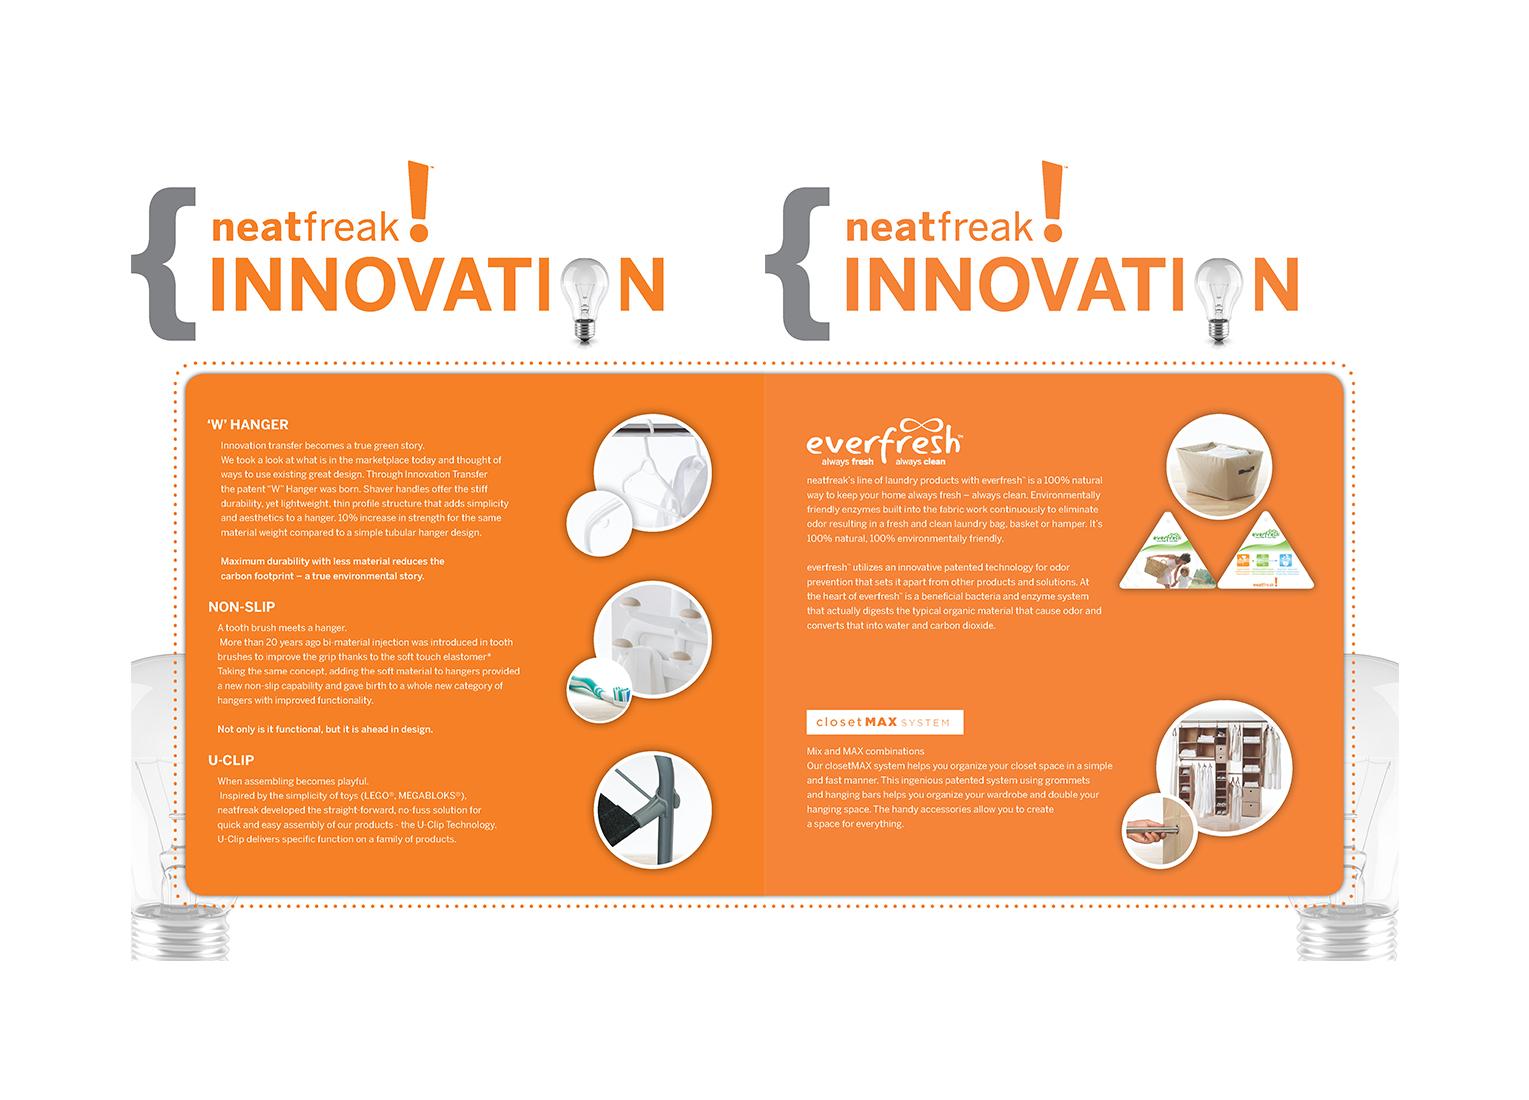 Copy of Neatfreak Innovation Team Creative